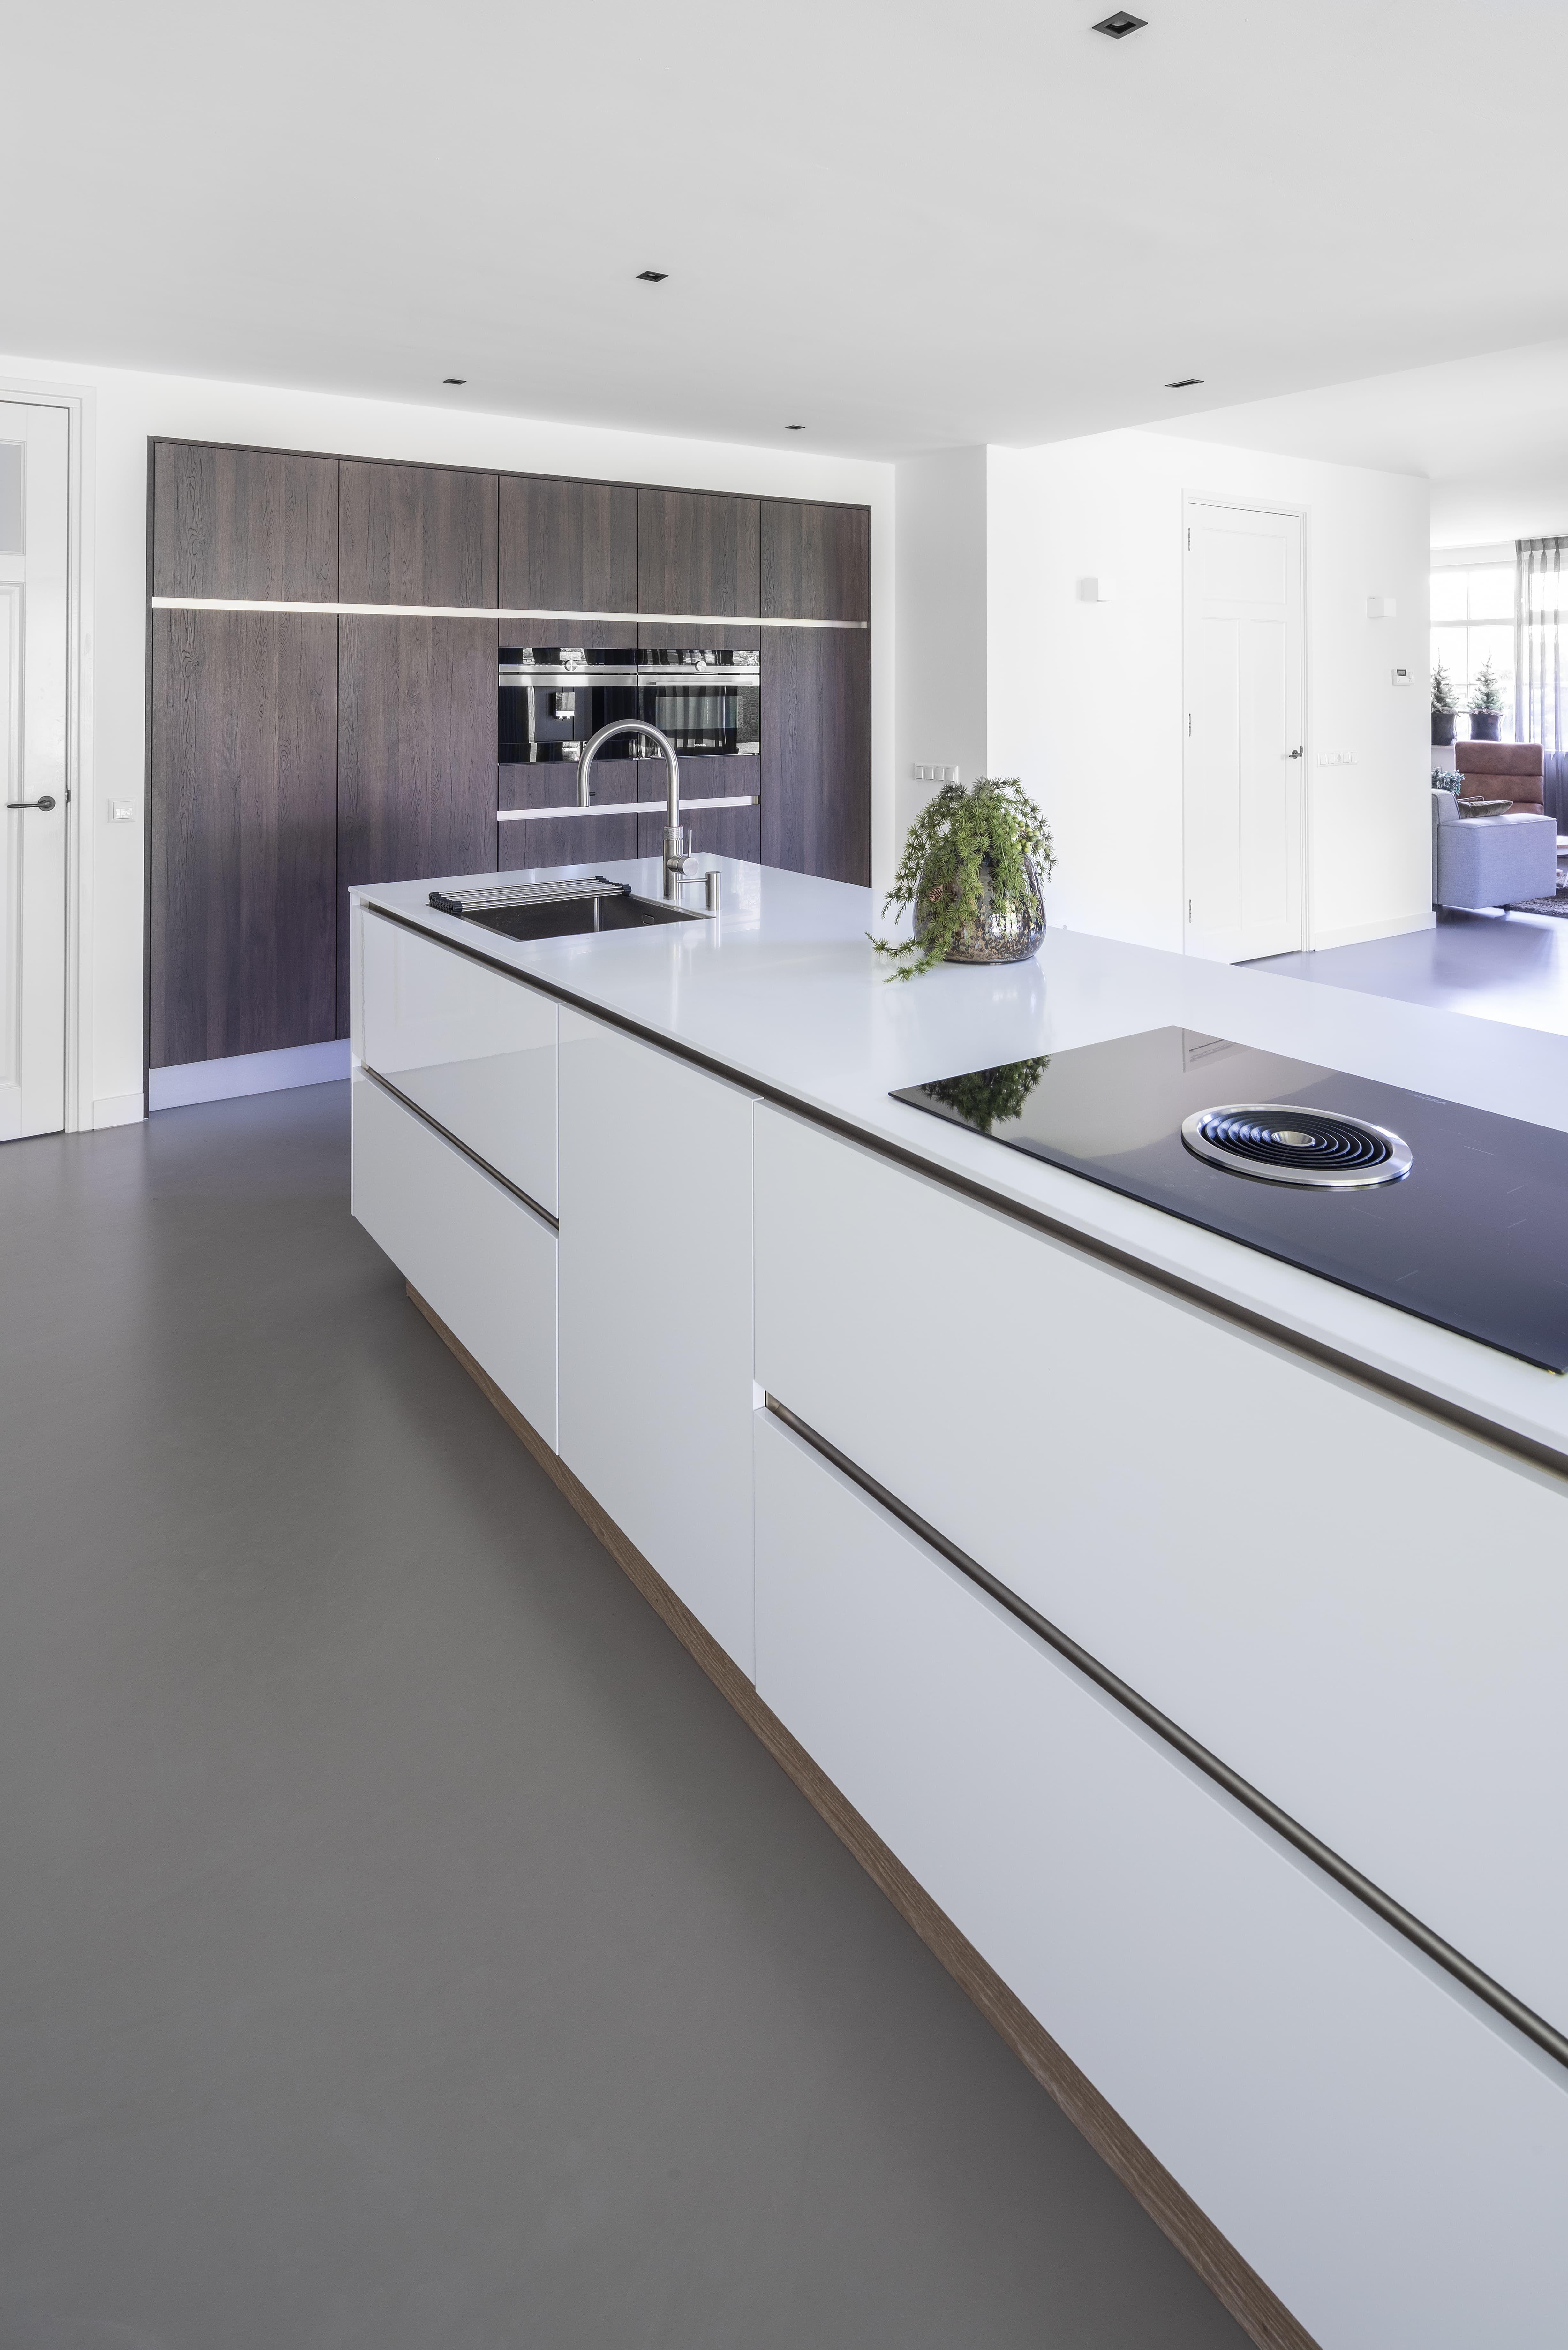 Strakke En Moderne Keuken Met Kookeiland Keuken Met Kookeiland Moderne Keuken Keuken Ontwerpen